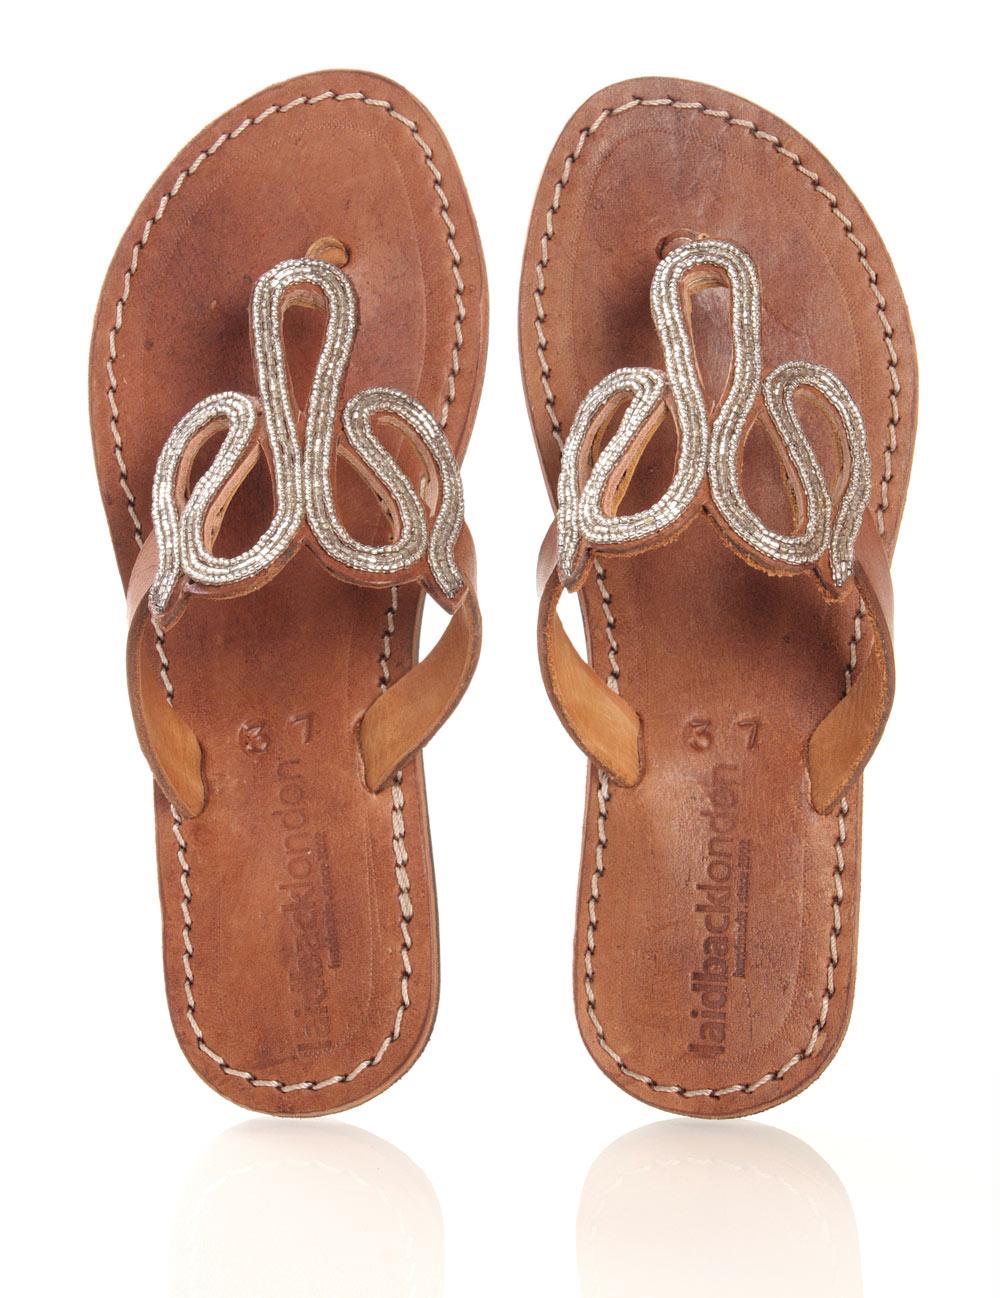 Leder-Sandale in braun